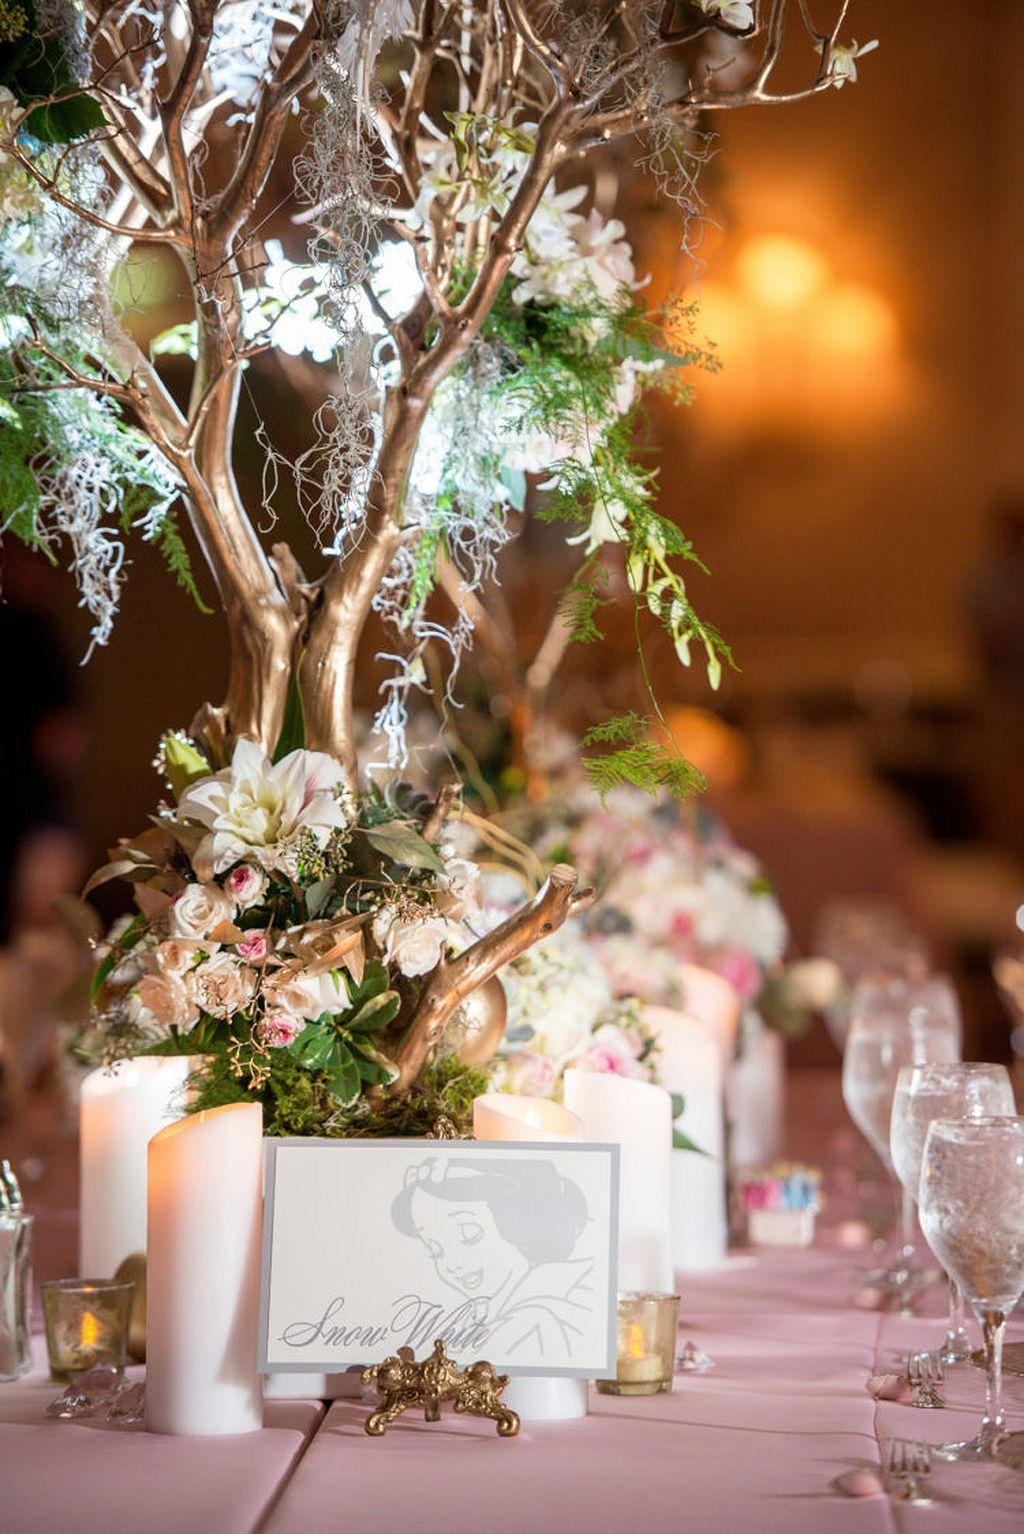 Amazing 80 Beautiful Disney Wedding Theme Ideas Httpsweddmagz